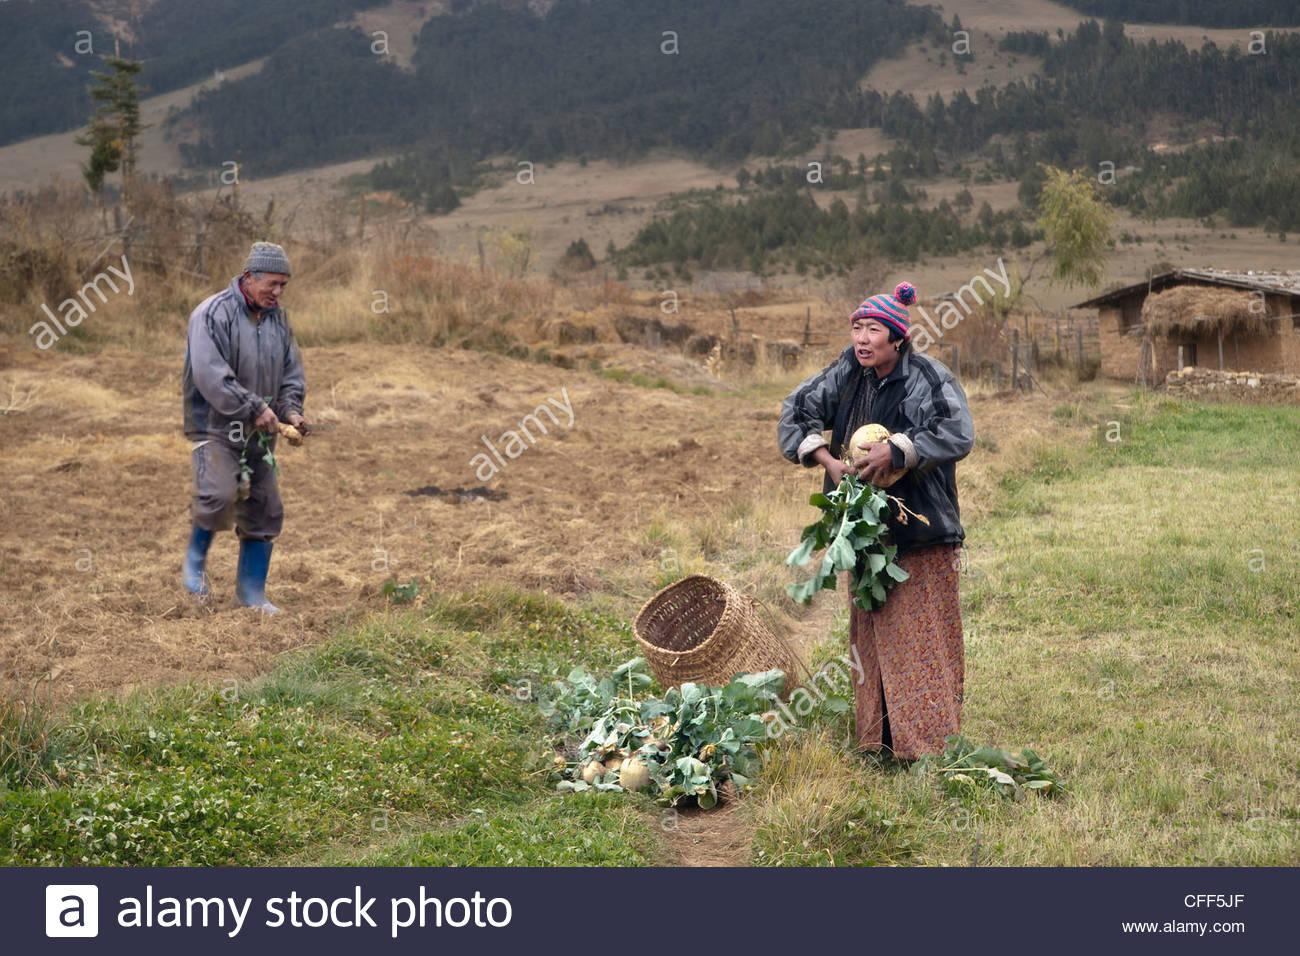 Turnip farmers, Bumthang Valley, Bhutan, Asia - Stock Image